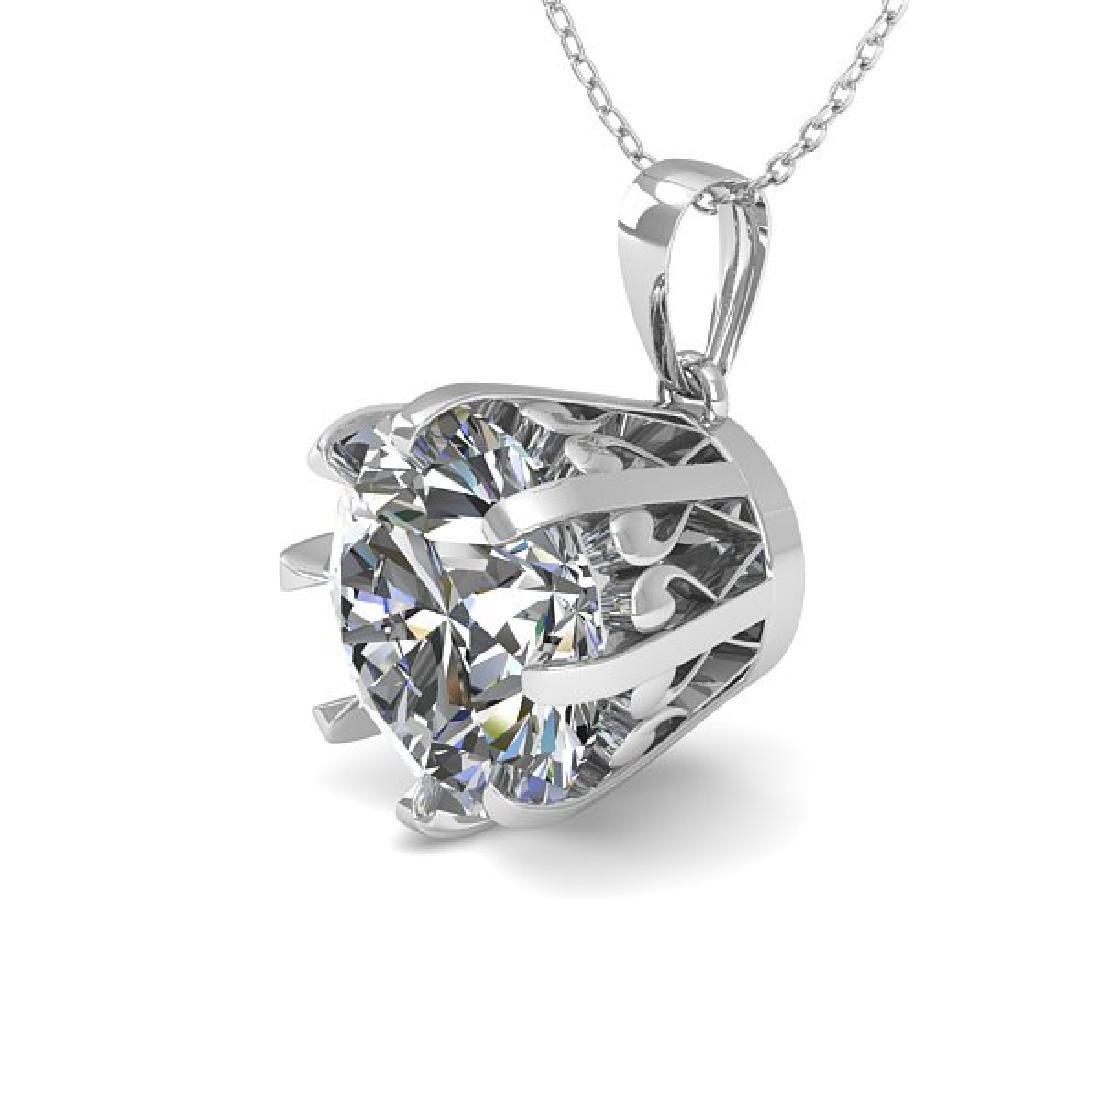 1.50 CTW Certified VS/SI Diamond Necklace 14K White